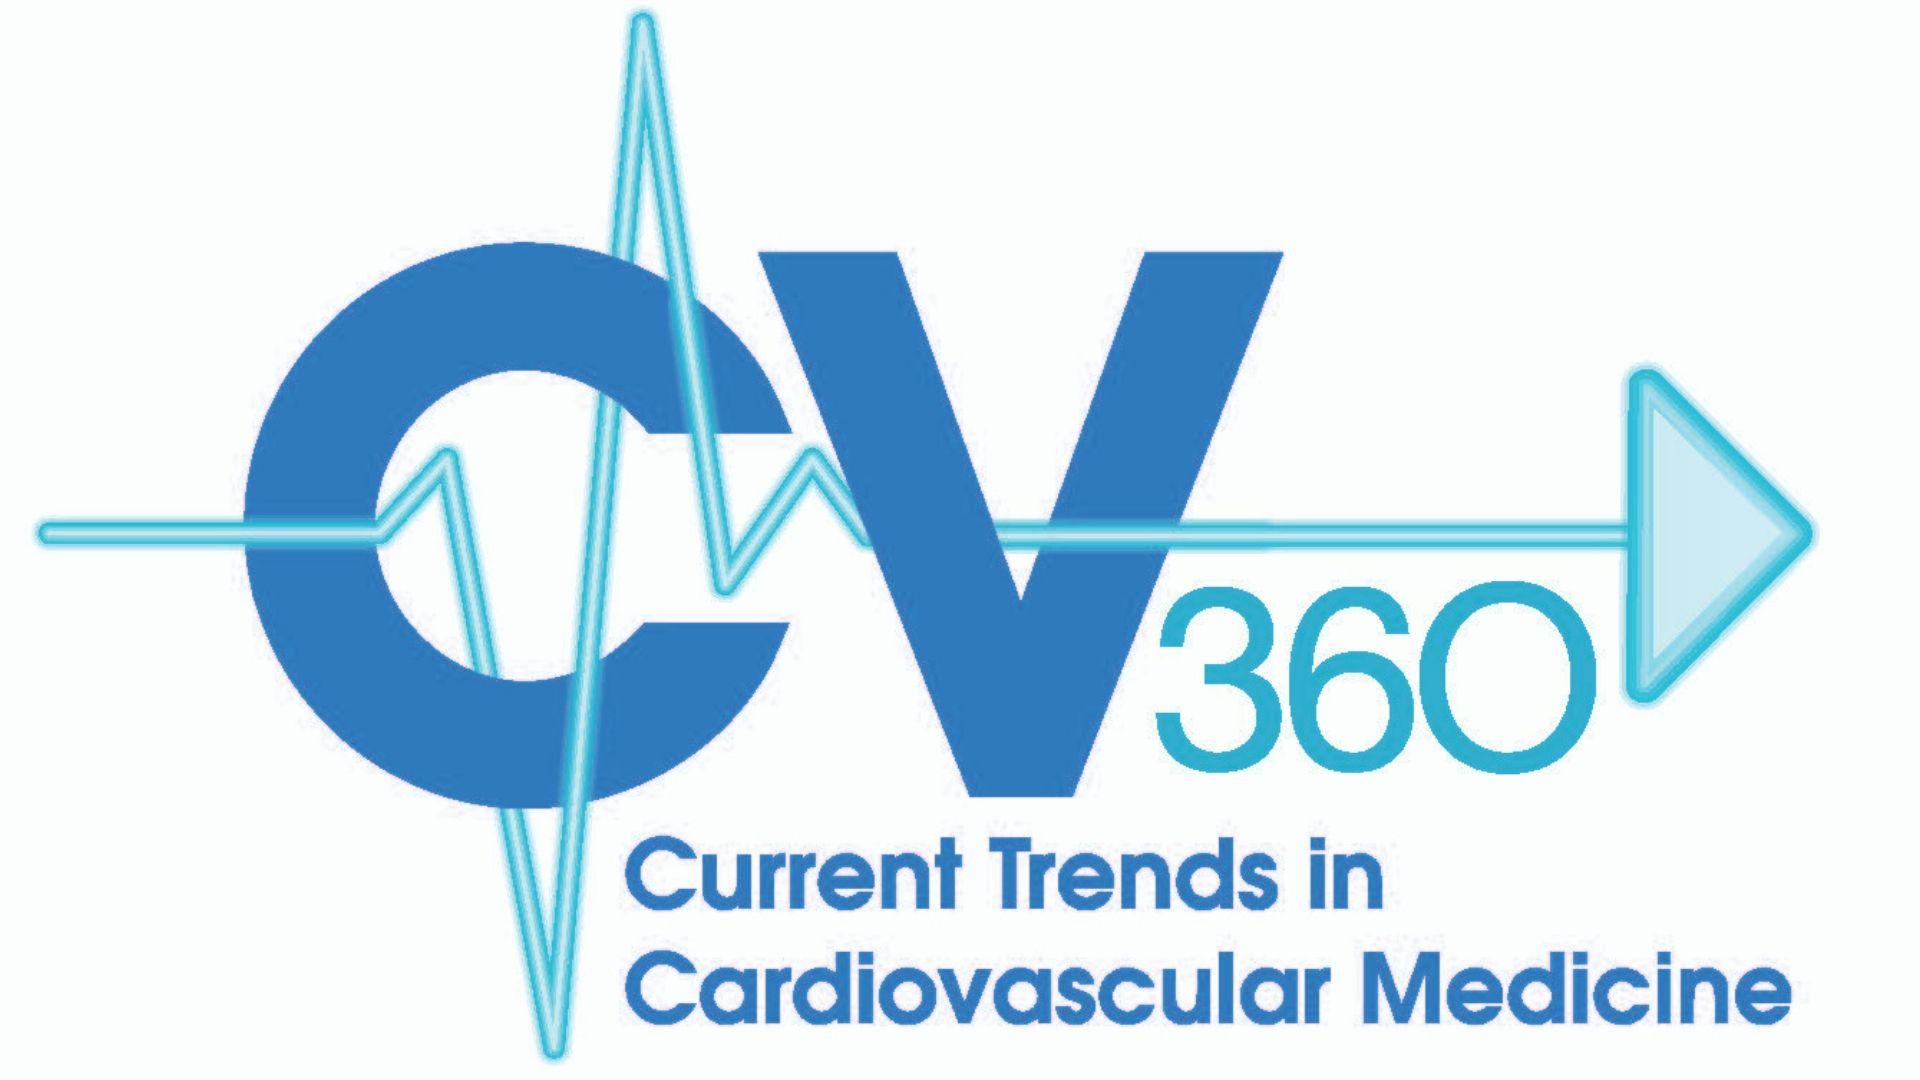 CV 360 Current Trends in Cardiovascular Medicine